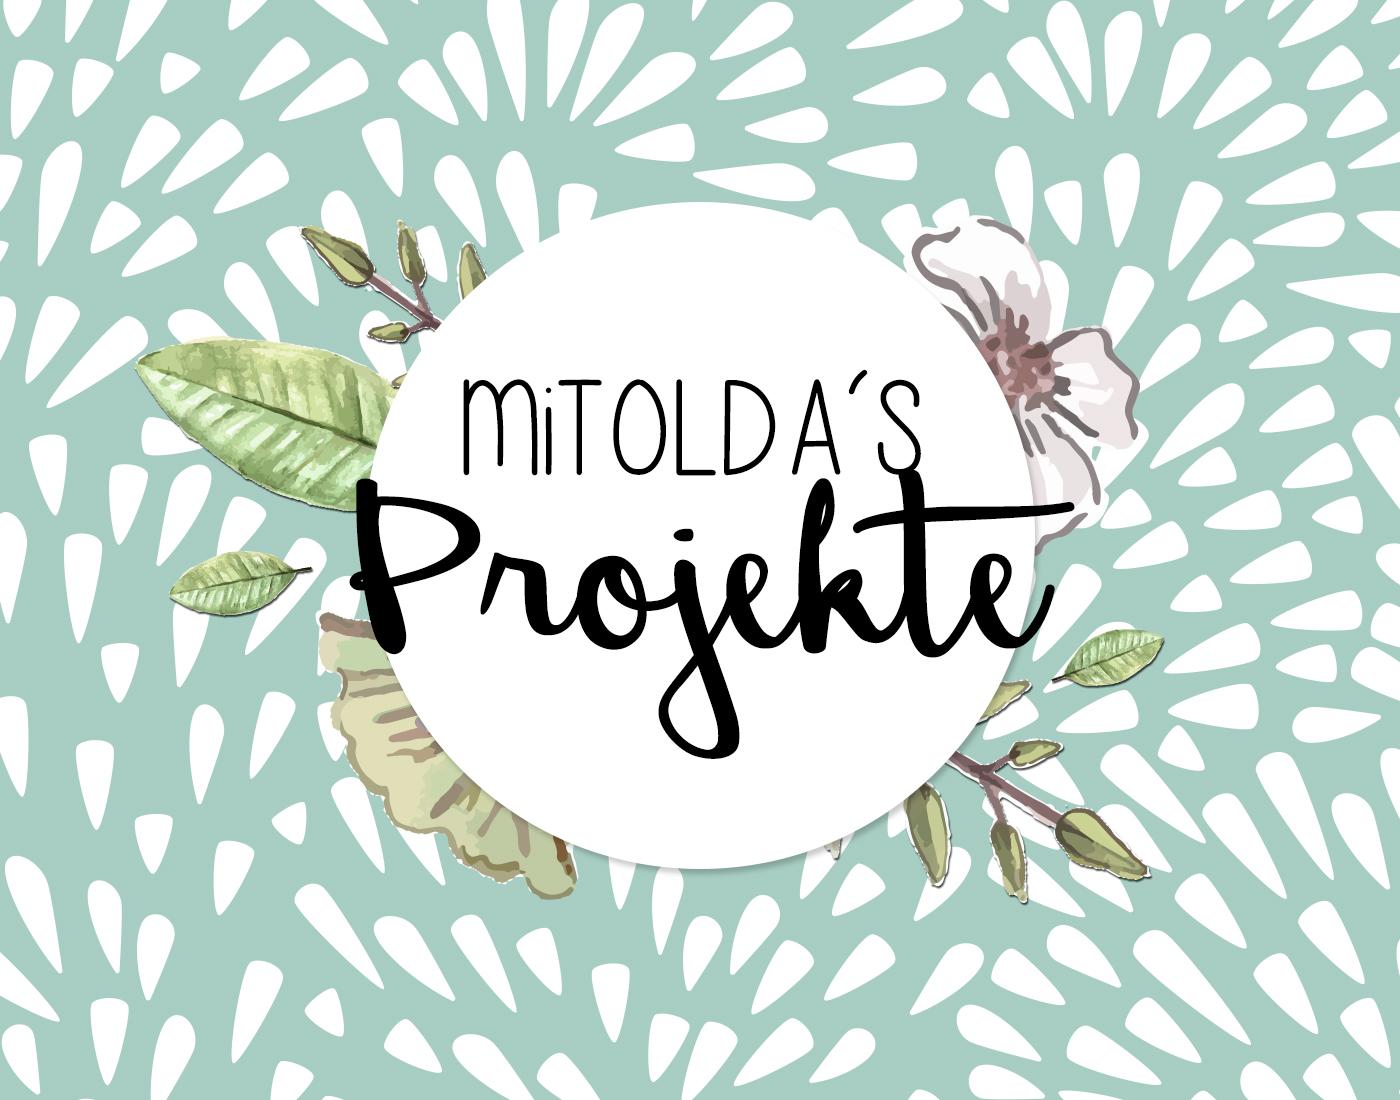 Mitolda's Projekte